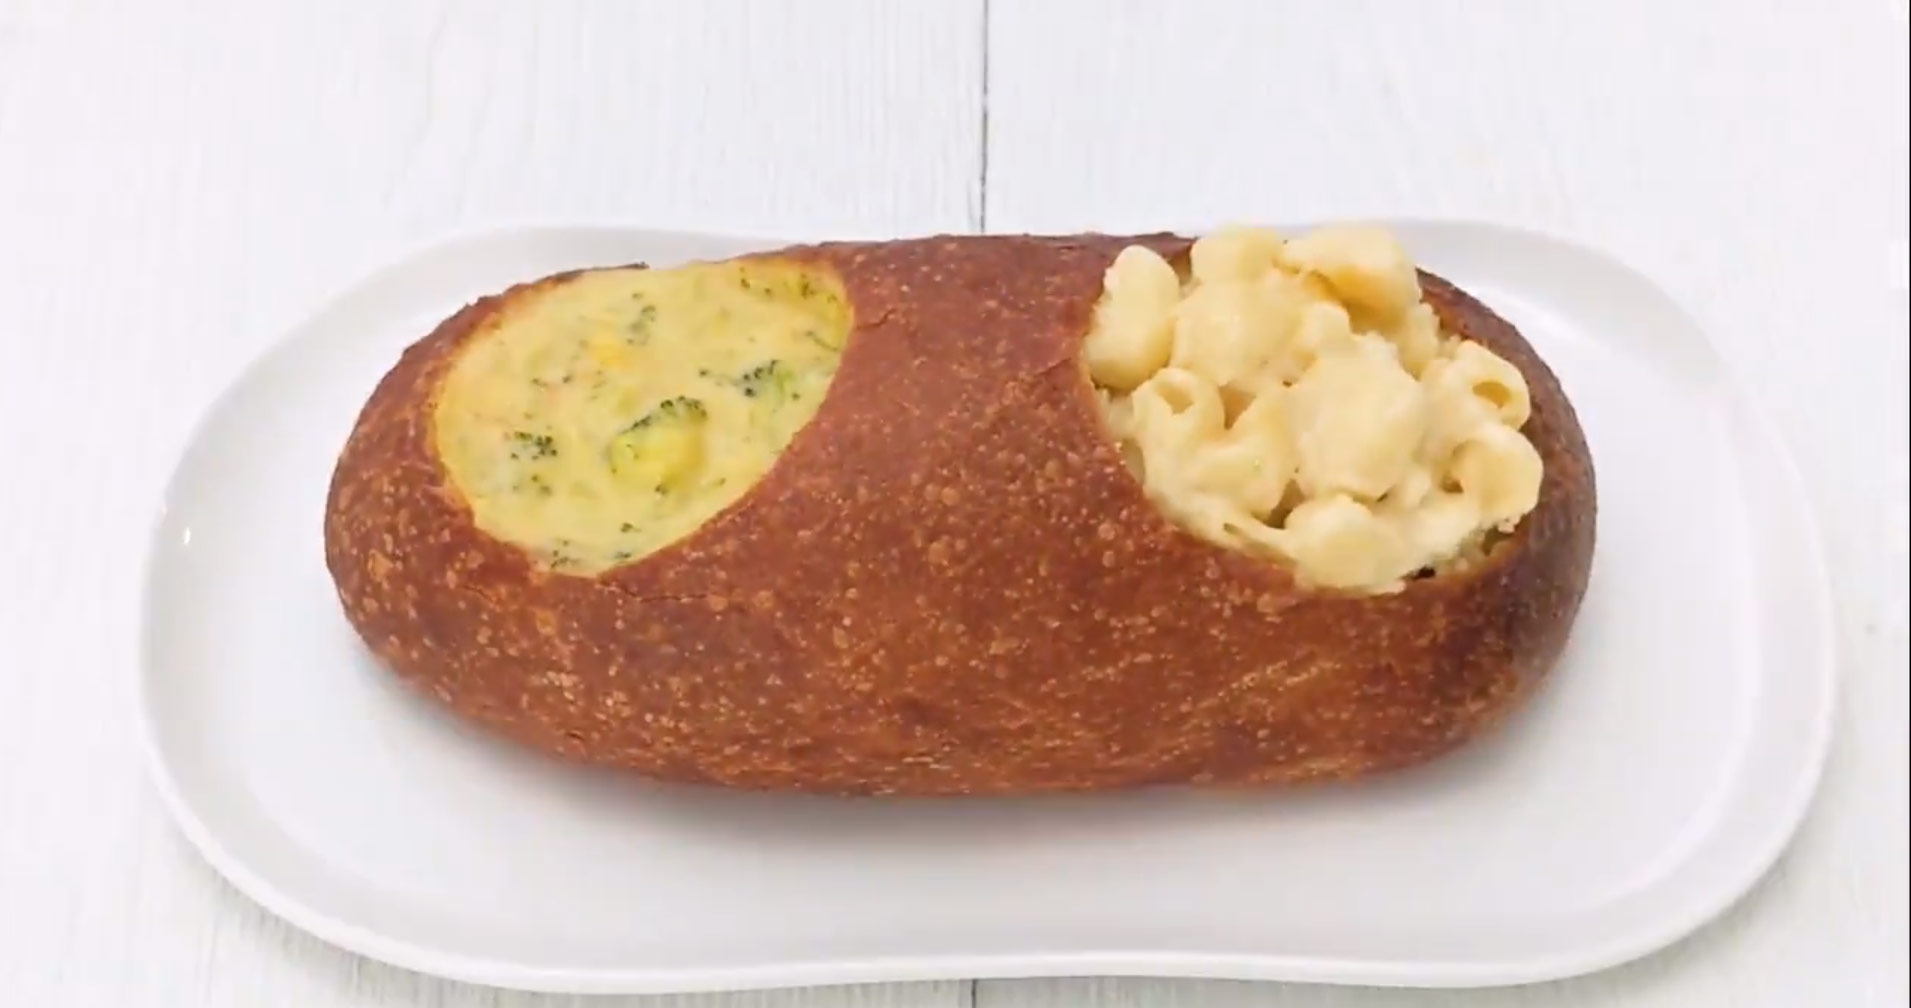 2018-07-31-Panera-Double-Bread-Bowl-3_1533064119001-873772057.jpg